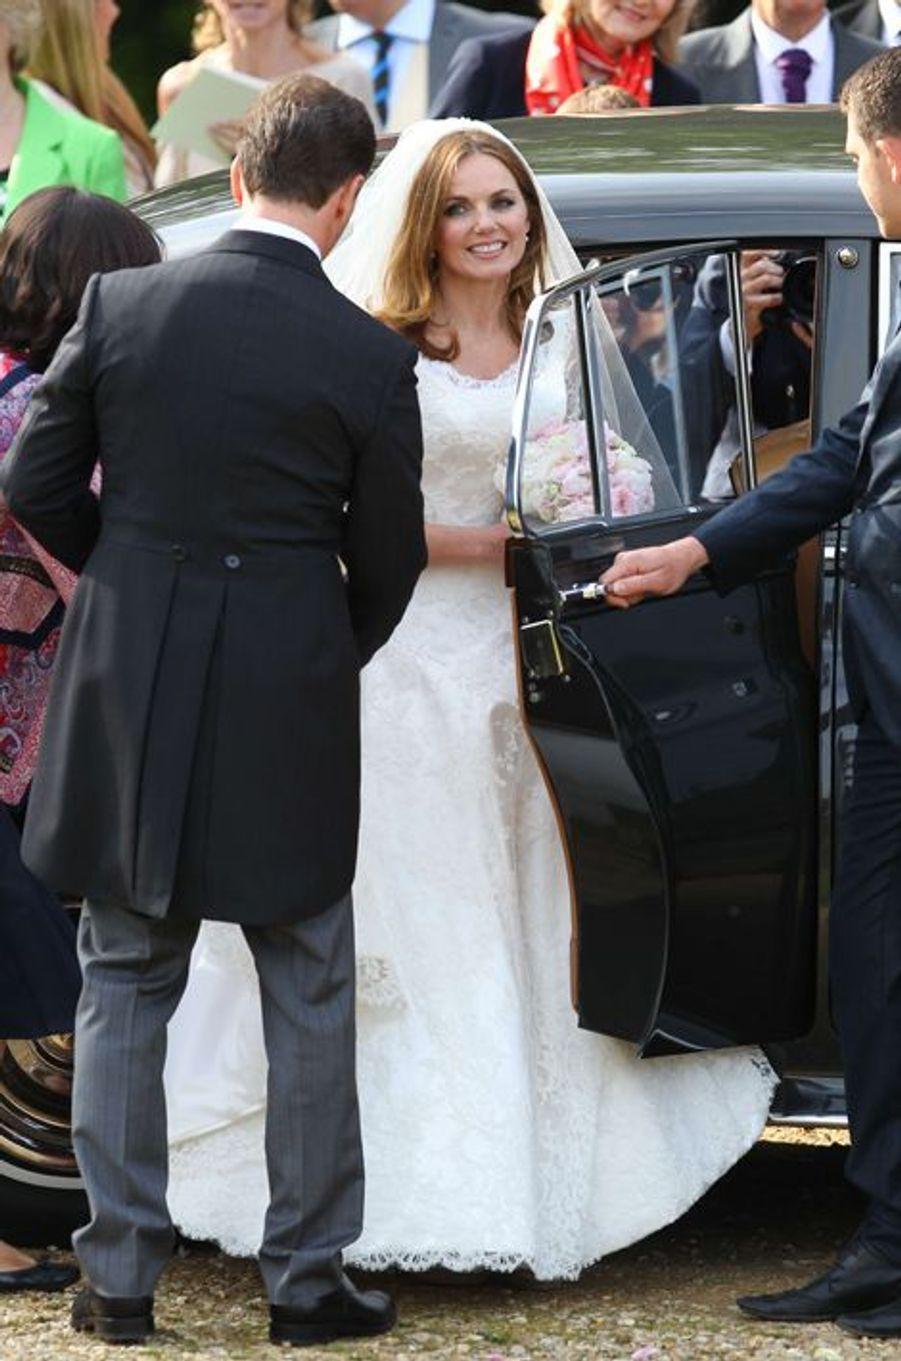 Le mariage de Geri Halliwell et Christian Horner